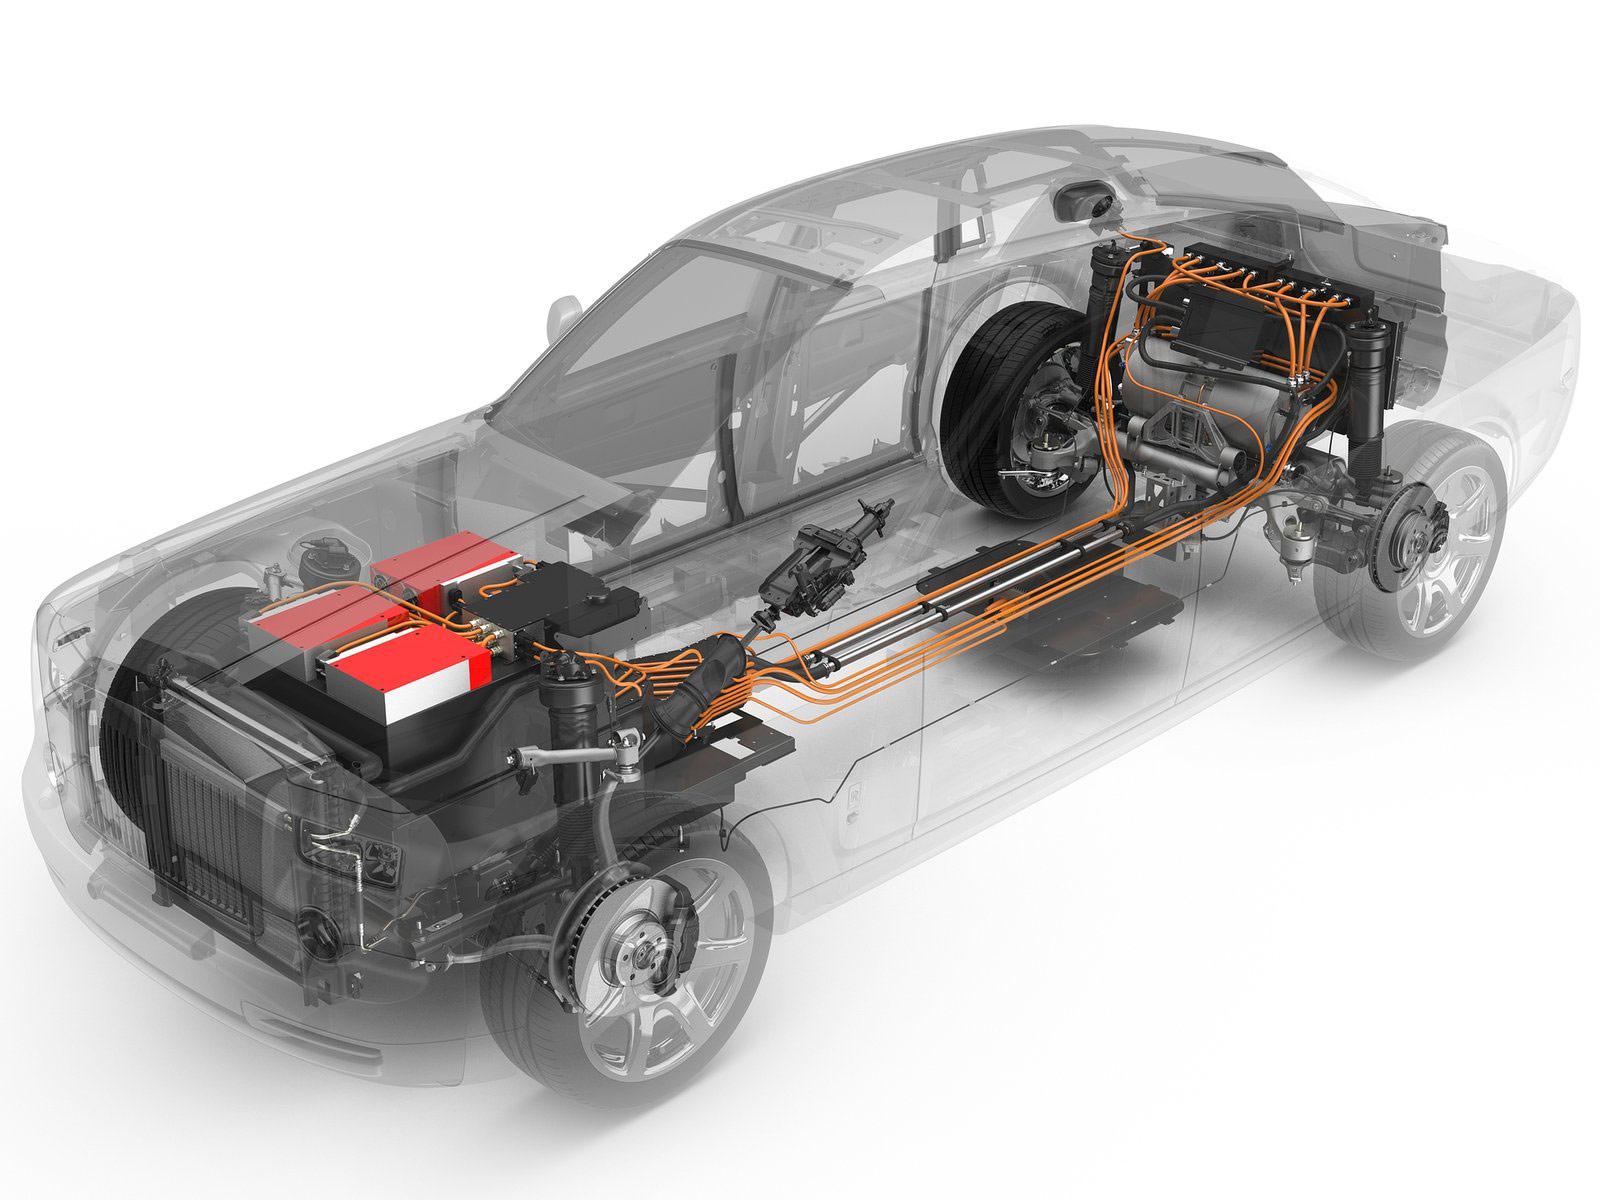 2011 Rolls Royce 102ex Electric Concept Car Desktop